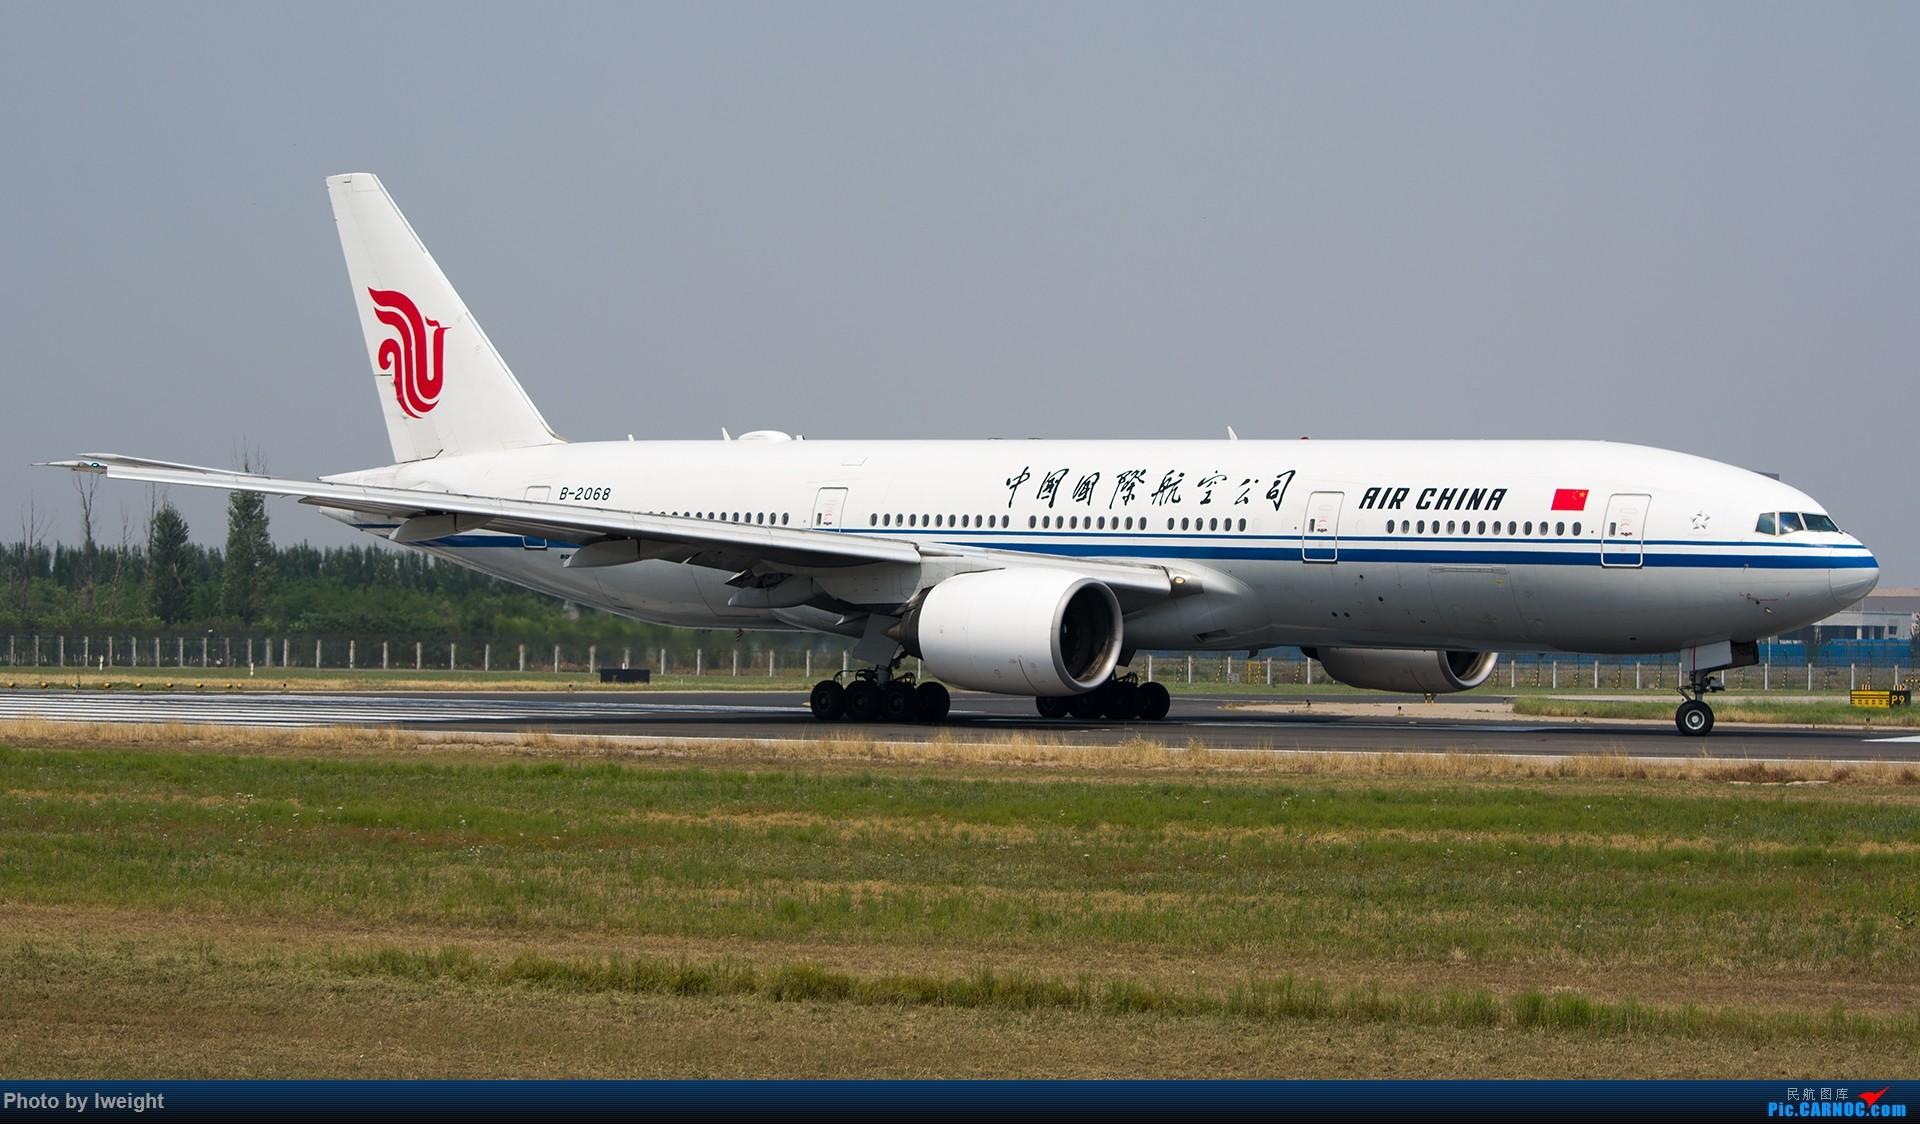 Re:[原创]周末帝都霾天拍机,凑合看看吧【2015-5-23】 BOEING 777-200 B-2068 中国北京首都国际机场